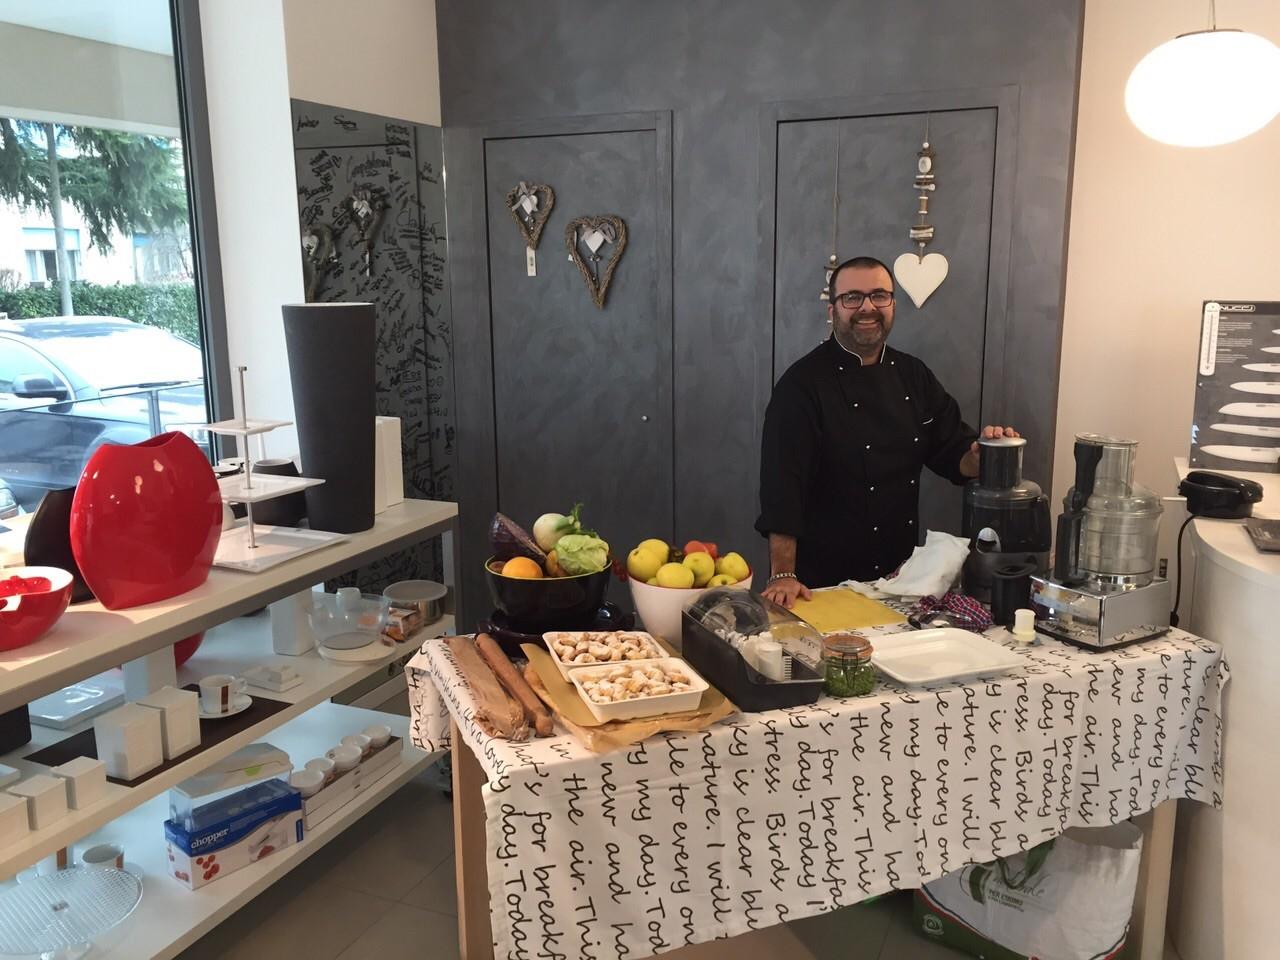 #Showcooking#cucinomediterraneo #biscotti #food #foodgram #instacool #organic #foodlovers #love #instadaily #instagood #instagramhub #follow #instamood #tweegram #foodie #foodphoto #magimix #sicilia #veneto #italia #homemade #foodintheair #eatfamous #flawlessfoodies #onmytable #chef #personalchef